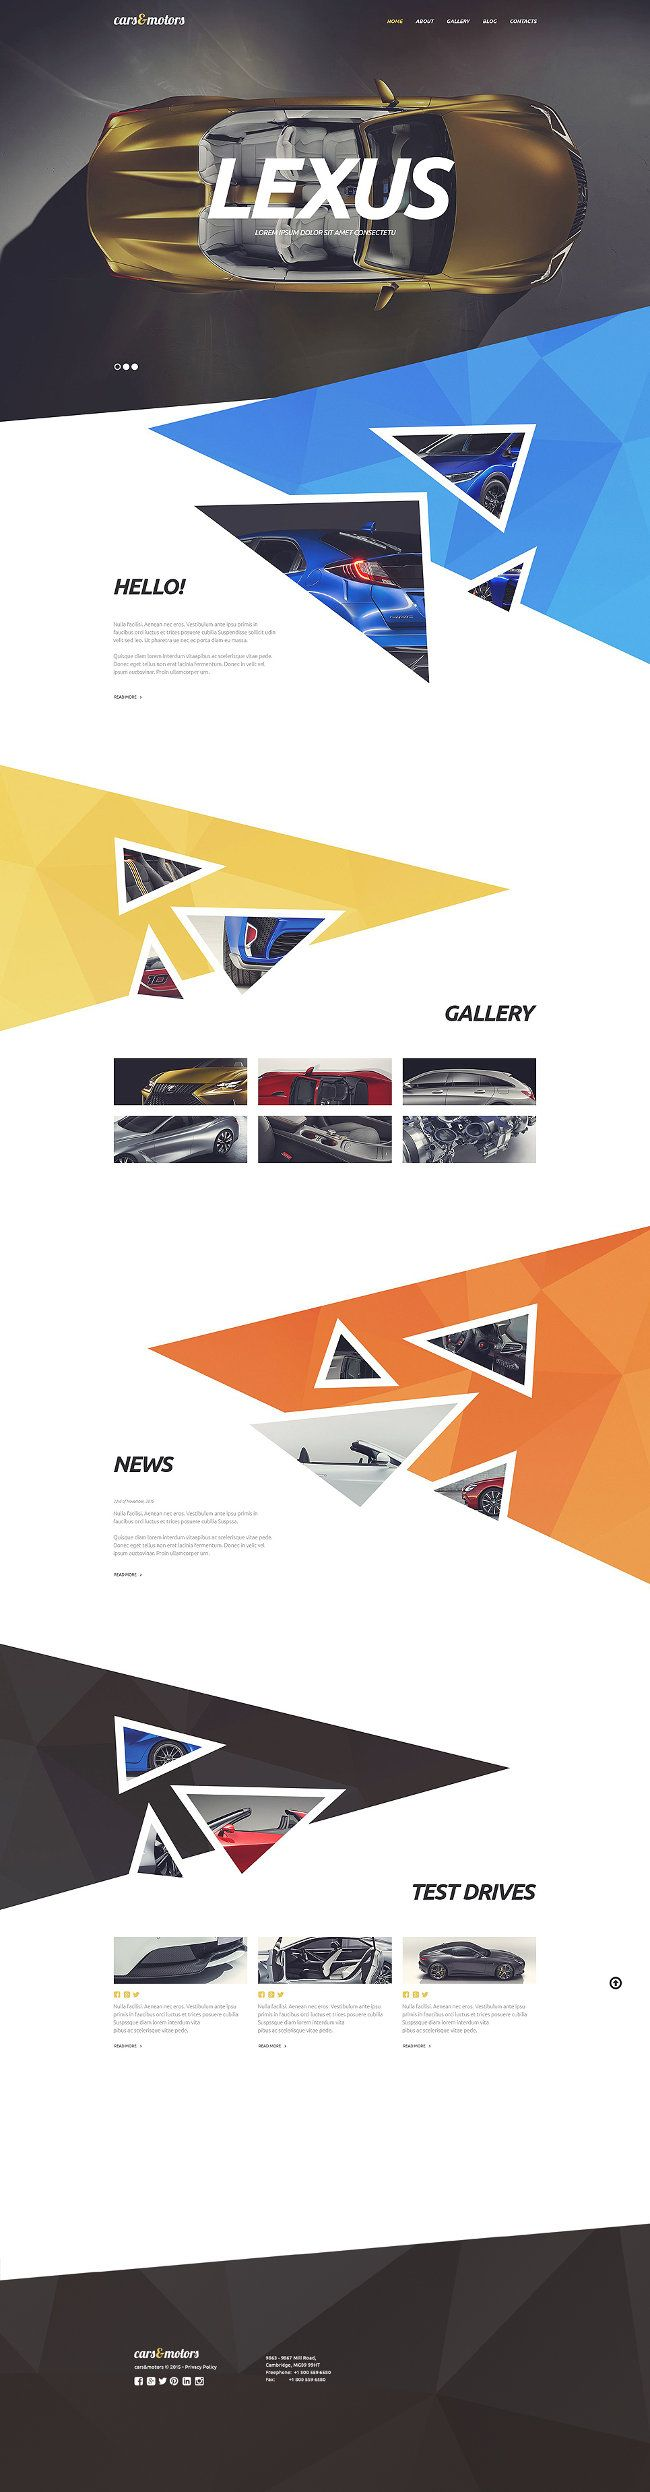 3970 best Tech design images on Pinterest | Charts, Info graphics ...